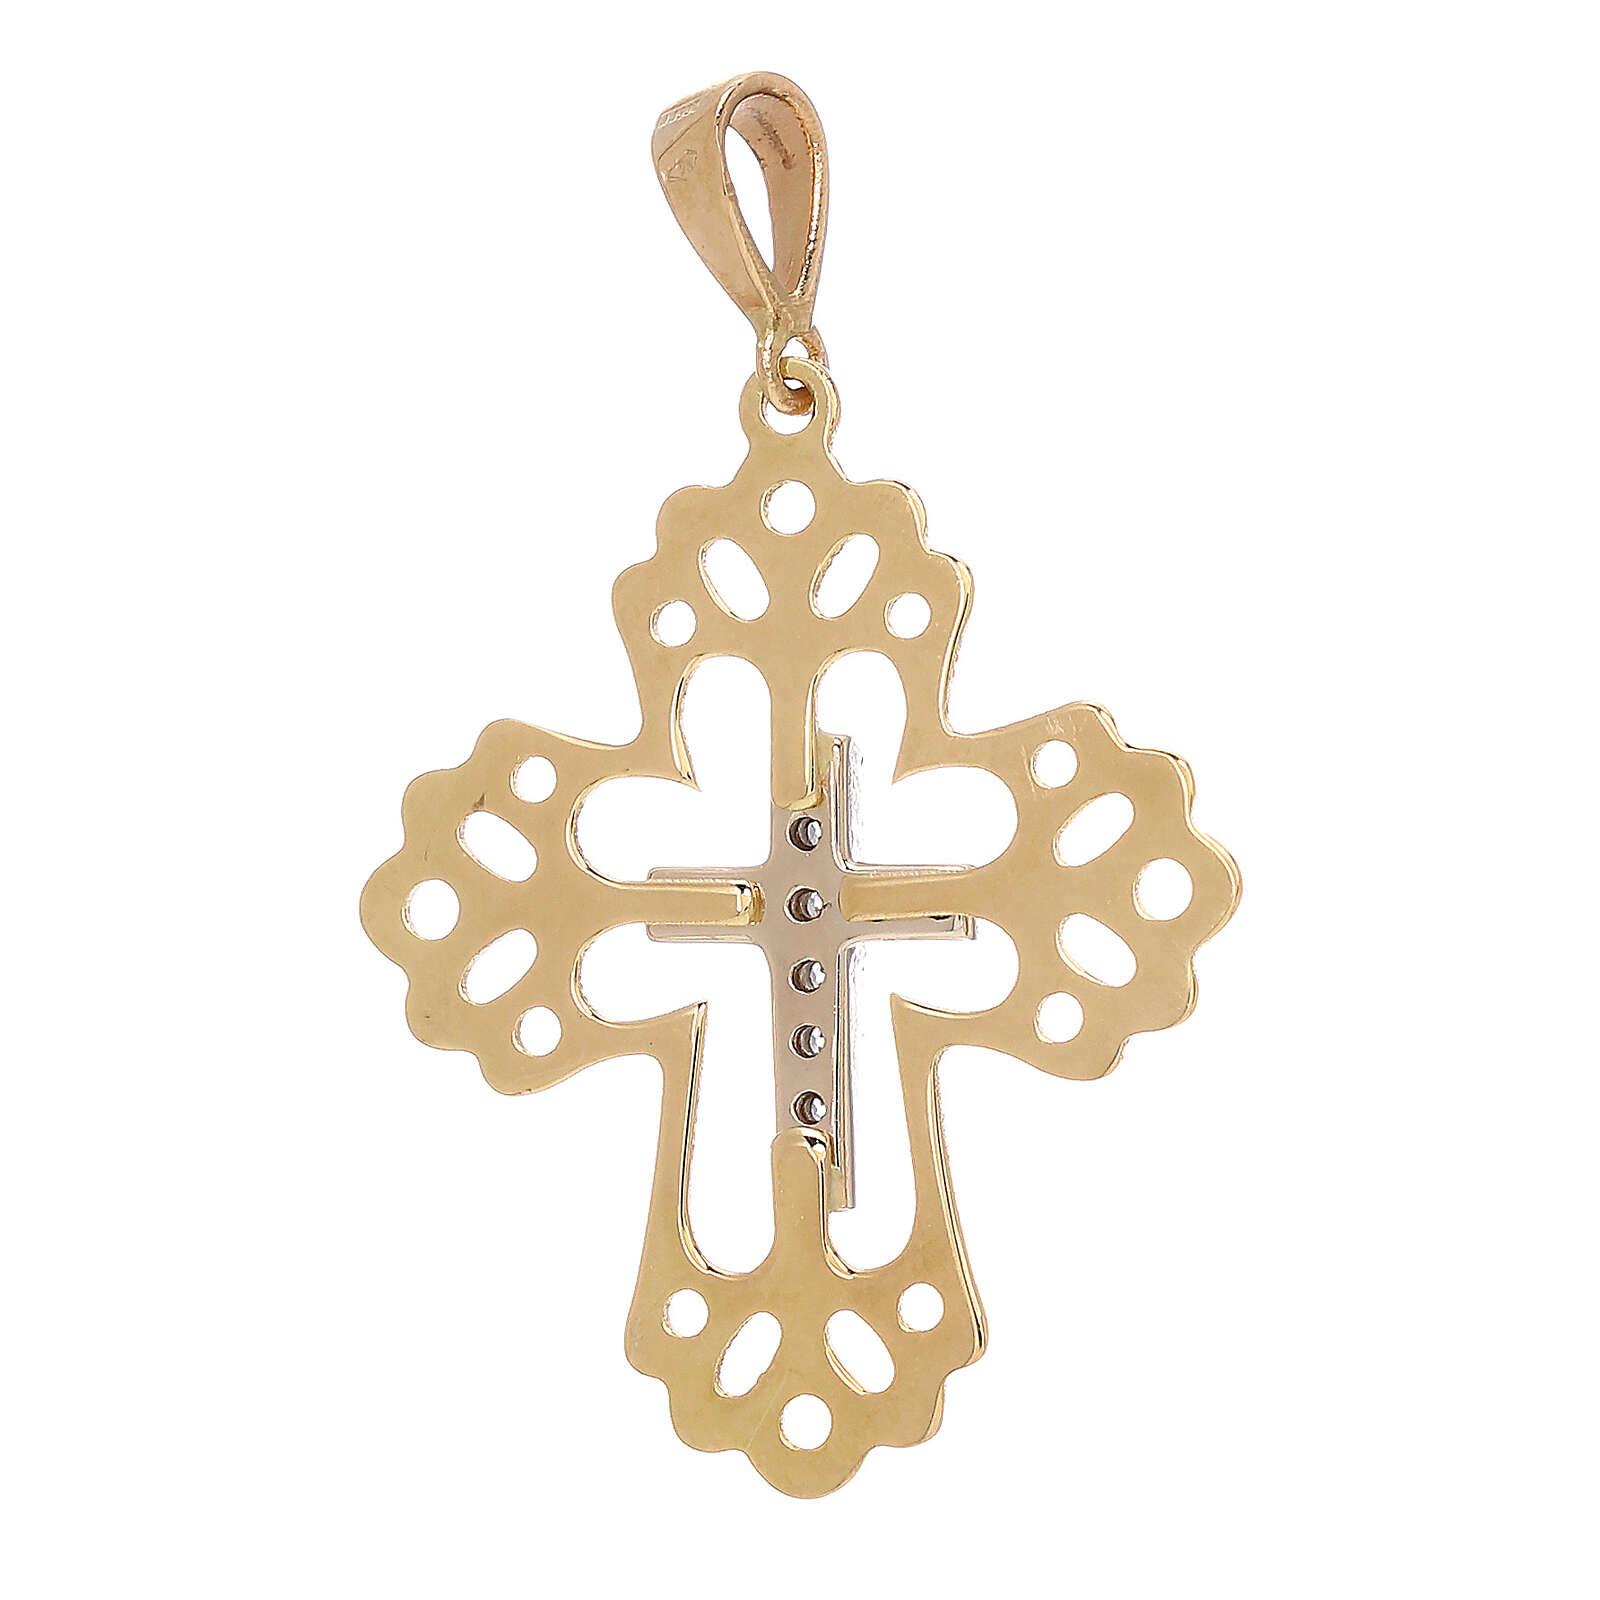 Colgante cruz Swarovski blancos marco perforado oro 18 k 4